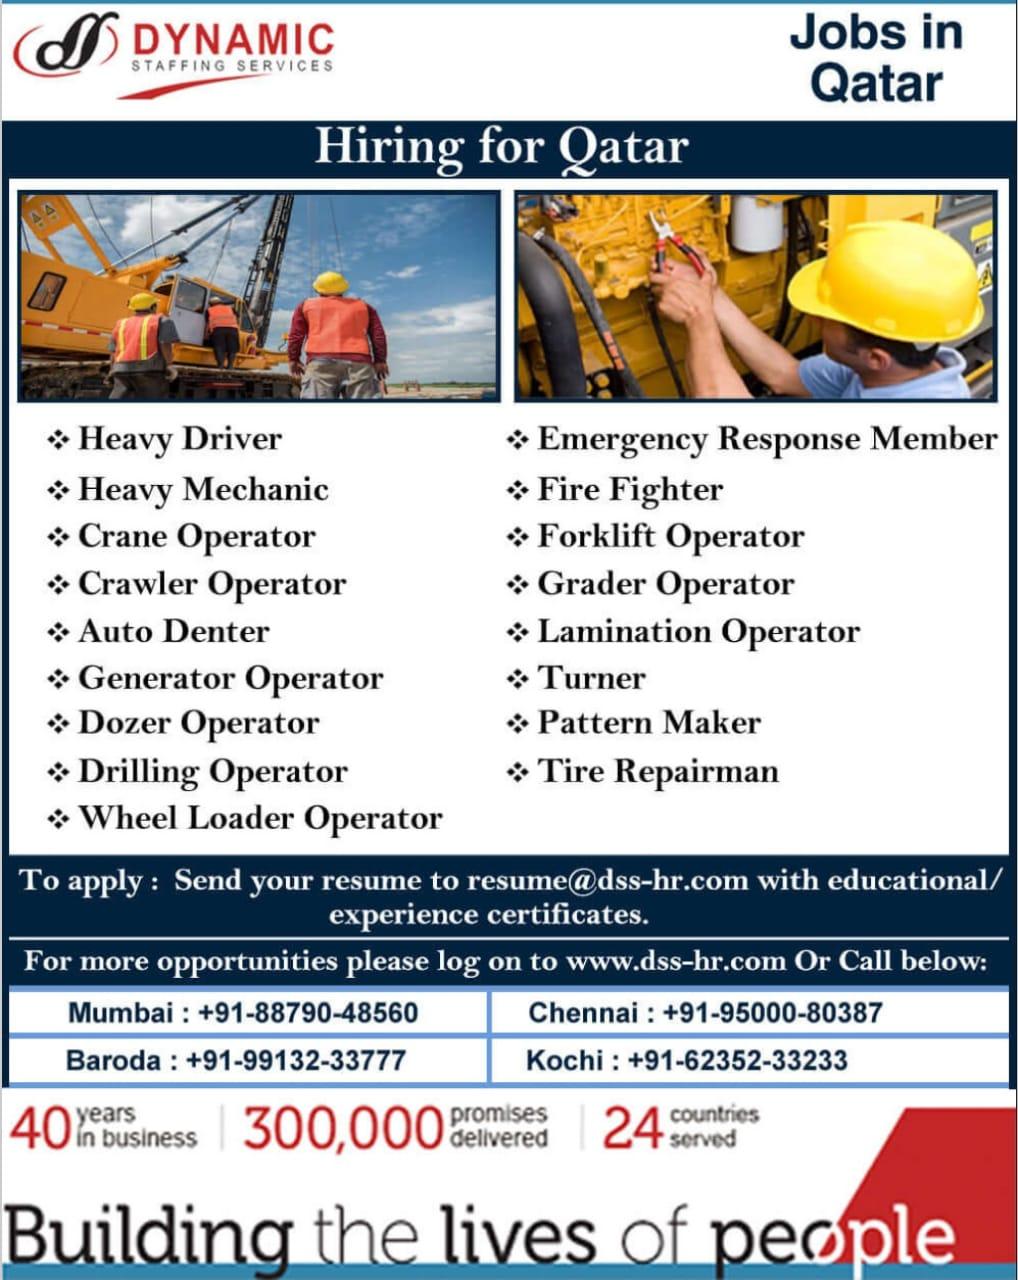 HIRING FOR QATAR